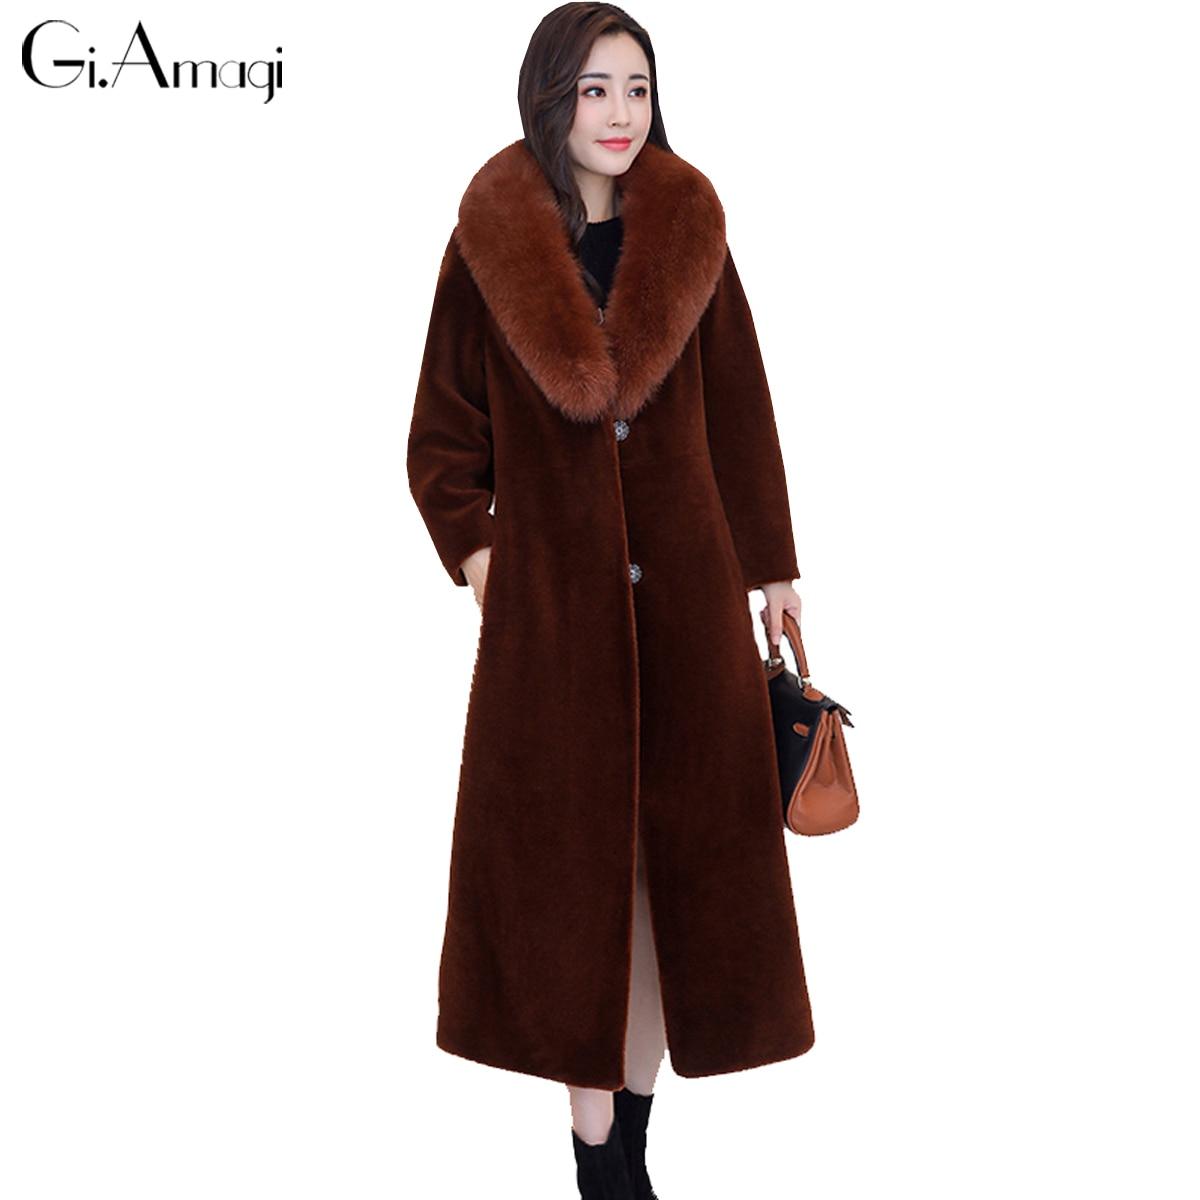 Fur Coat Wool Long Section Fox Fur Coat Unloaded Fur Collar 2017 Winter Women New Sheep Cut Cashmere Coat Faux Fur Jacket